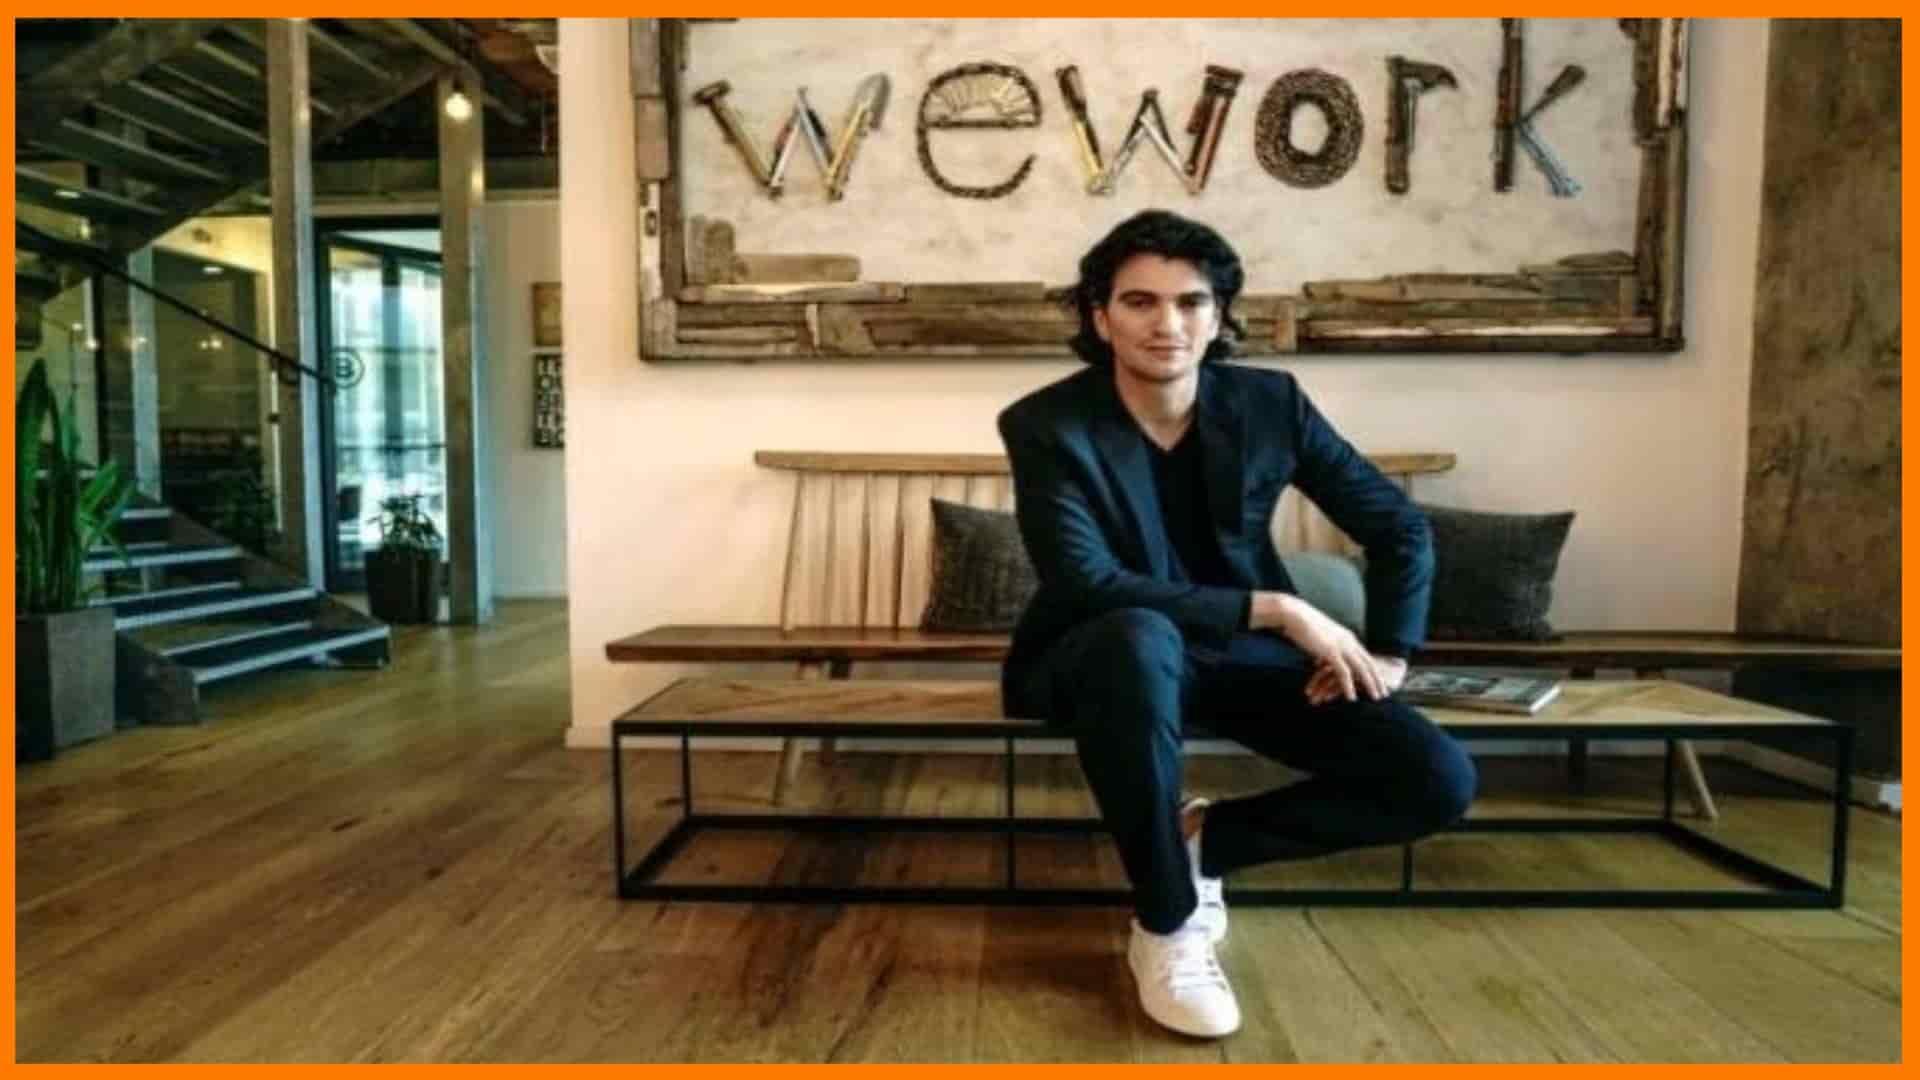 WeWork Workspaces - WeWork Case Study